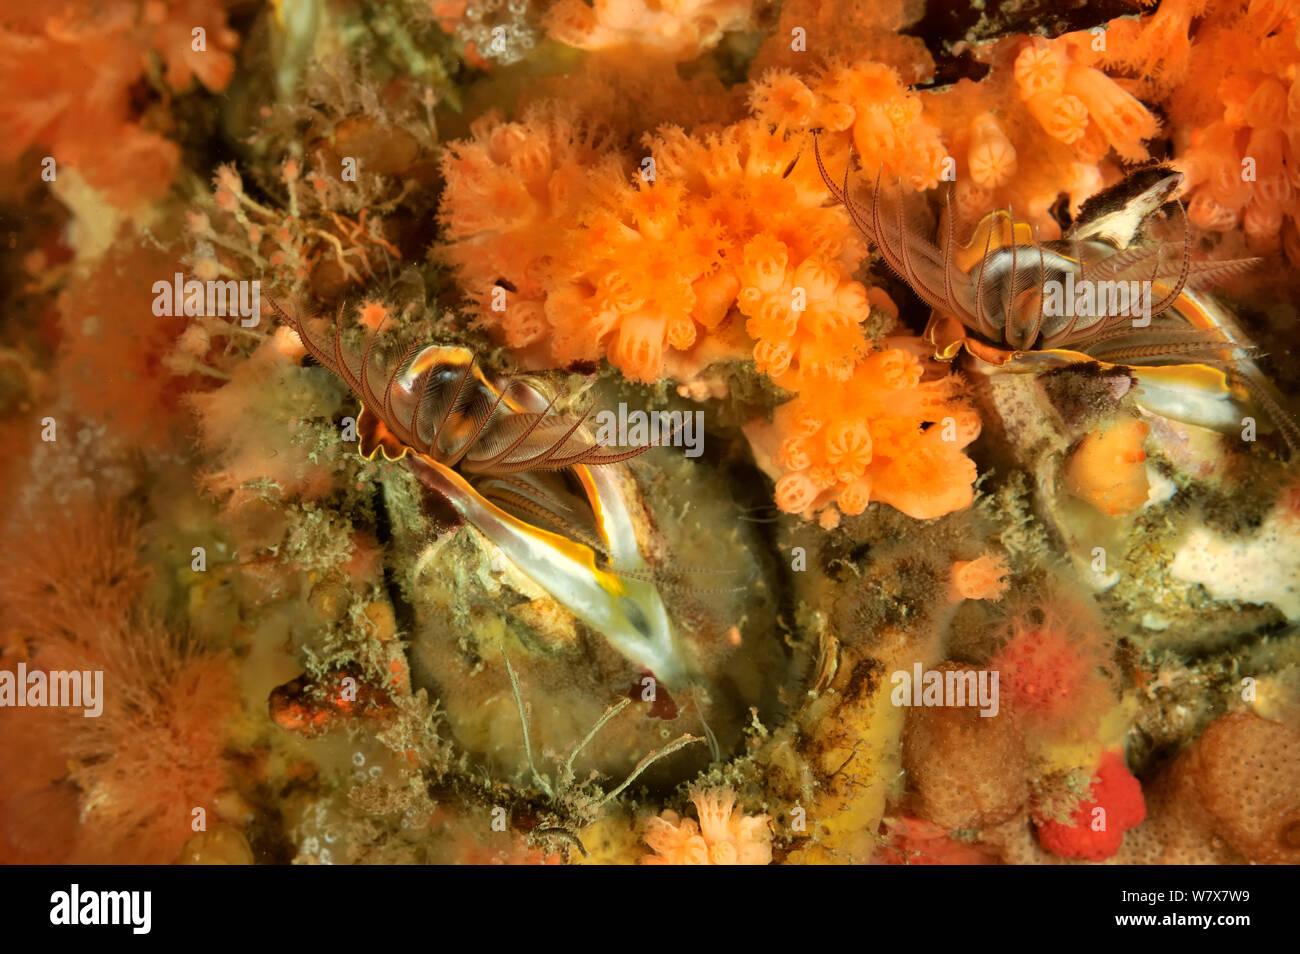 Giant barnacles (Balanus nubilus), Alaska, USA, Gulf of Alaska. Pacific ocean. Stock Photo